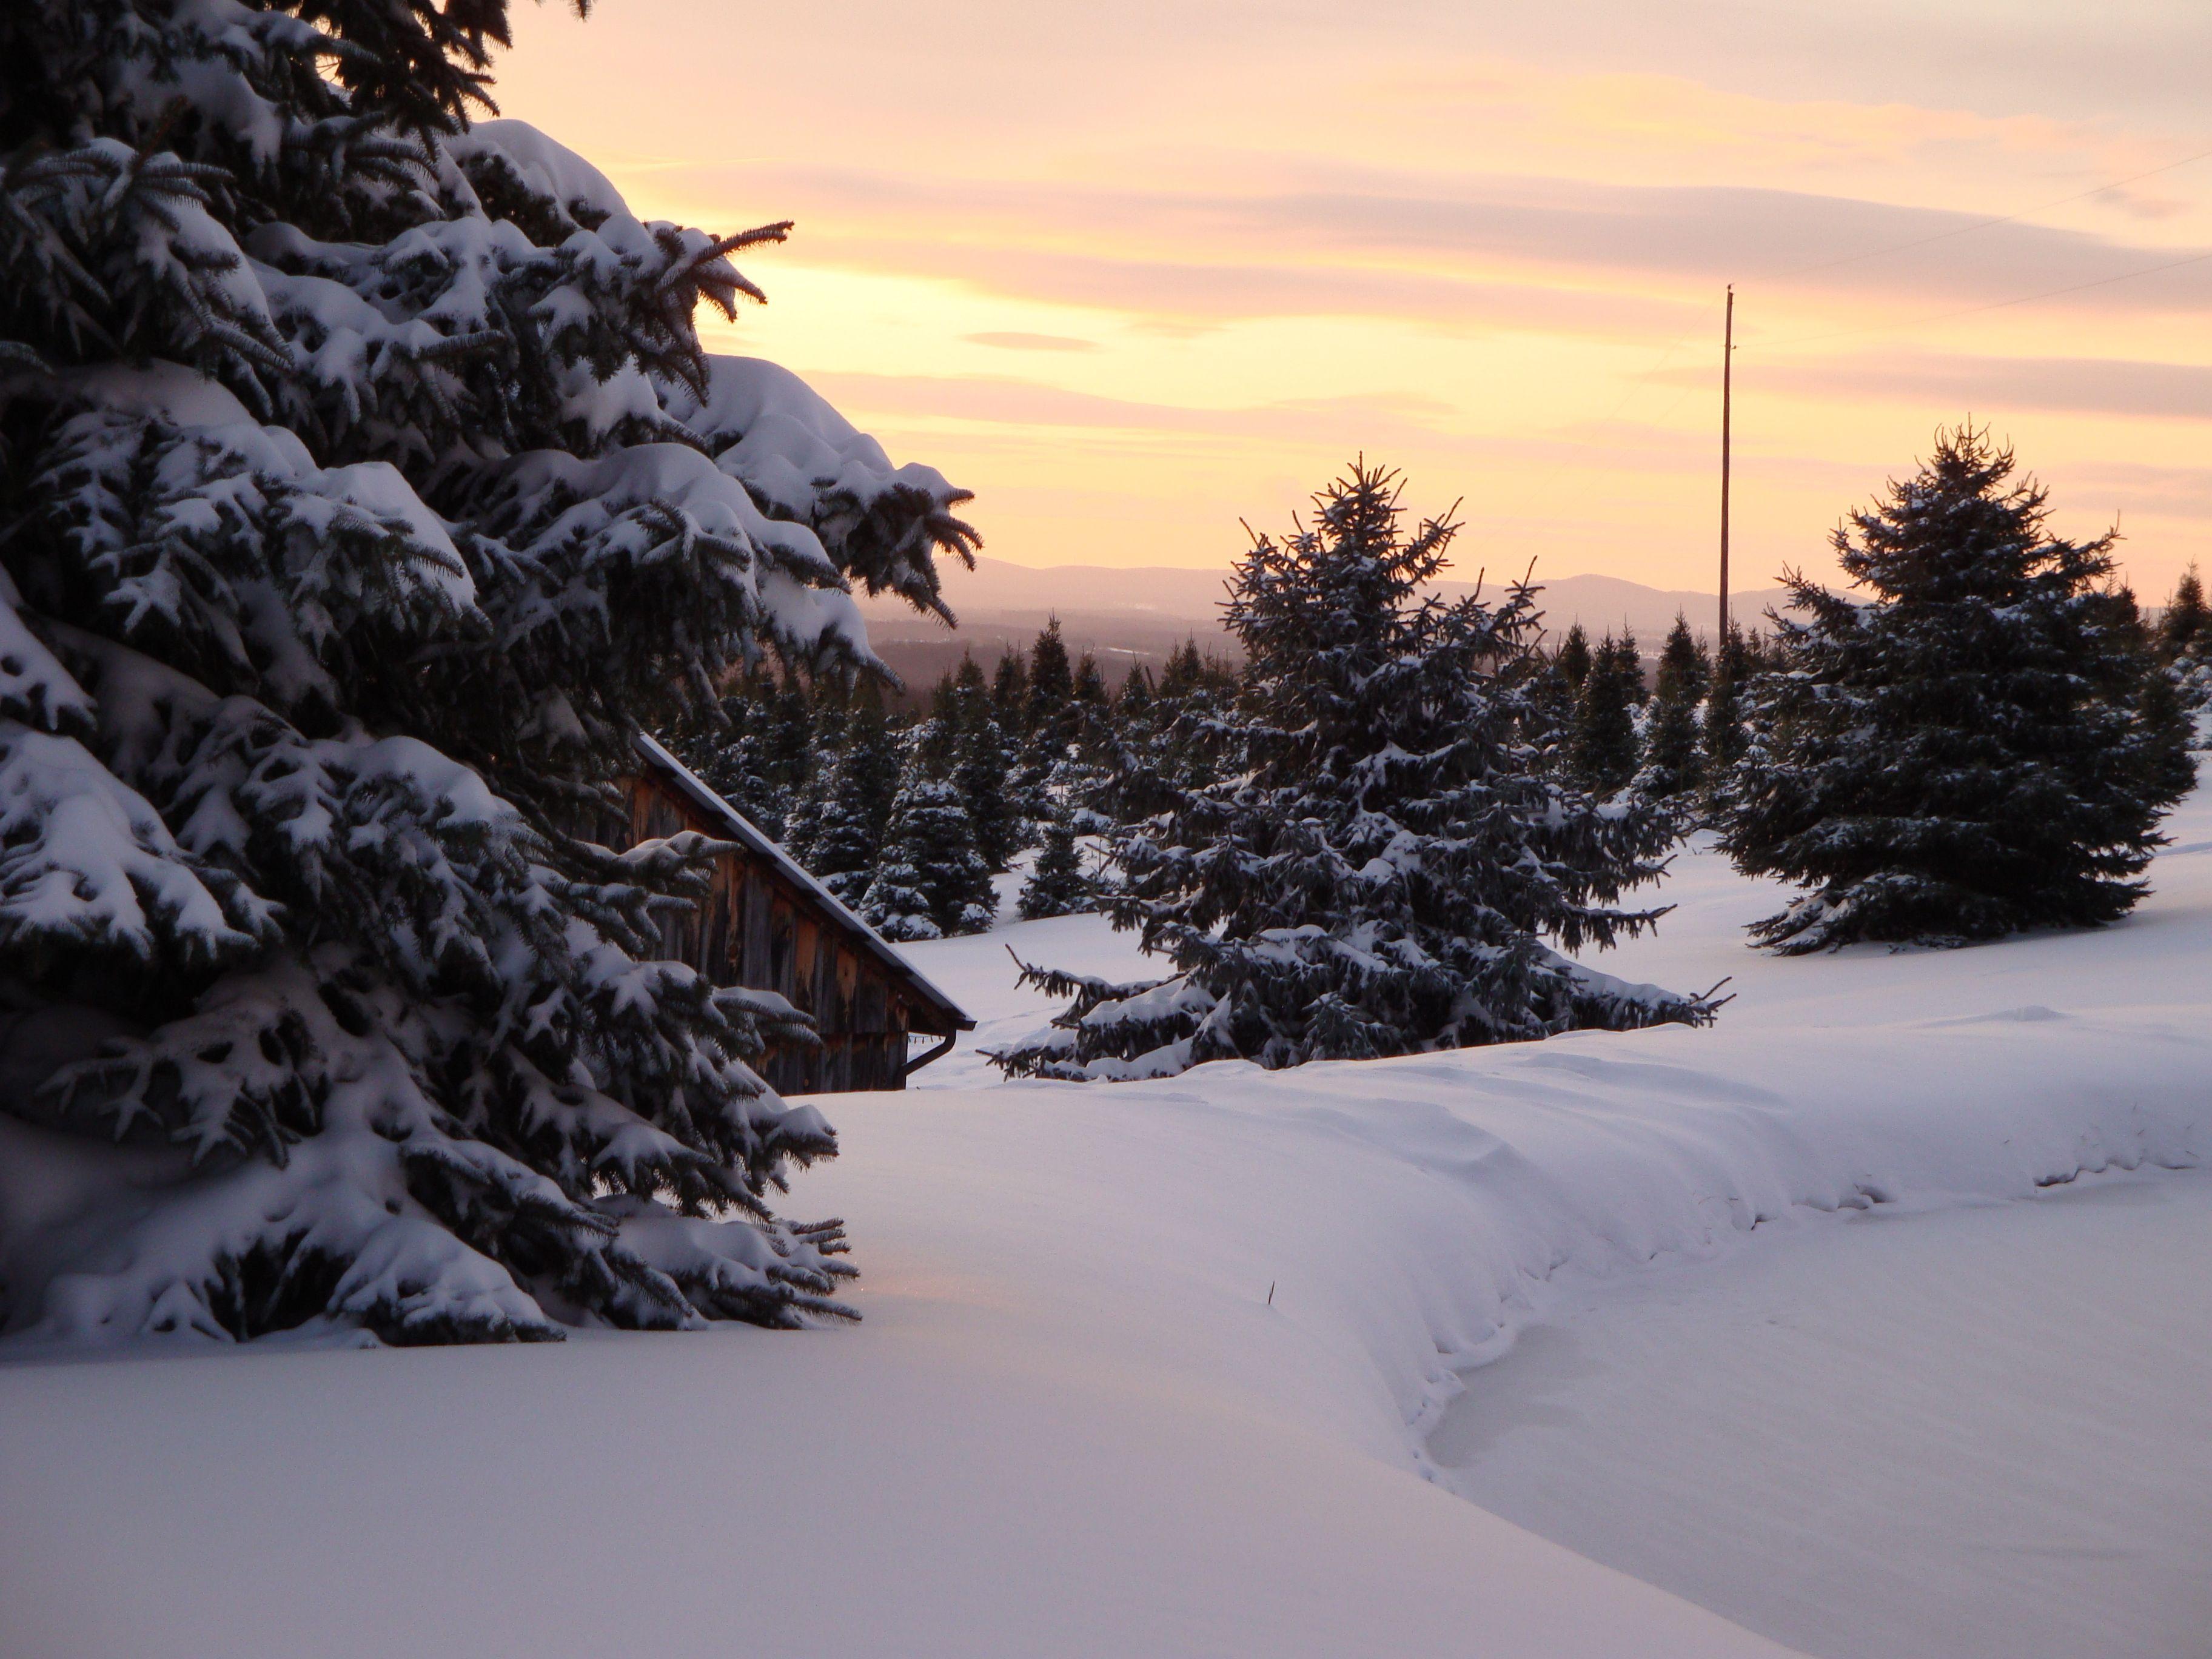 Sunrise Snickers Gap Tree Farm Tree Farms Snowy Trees Christmas Tree Farm